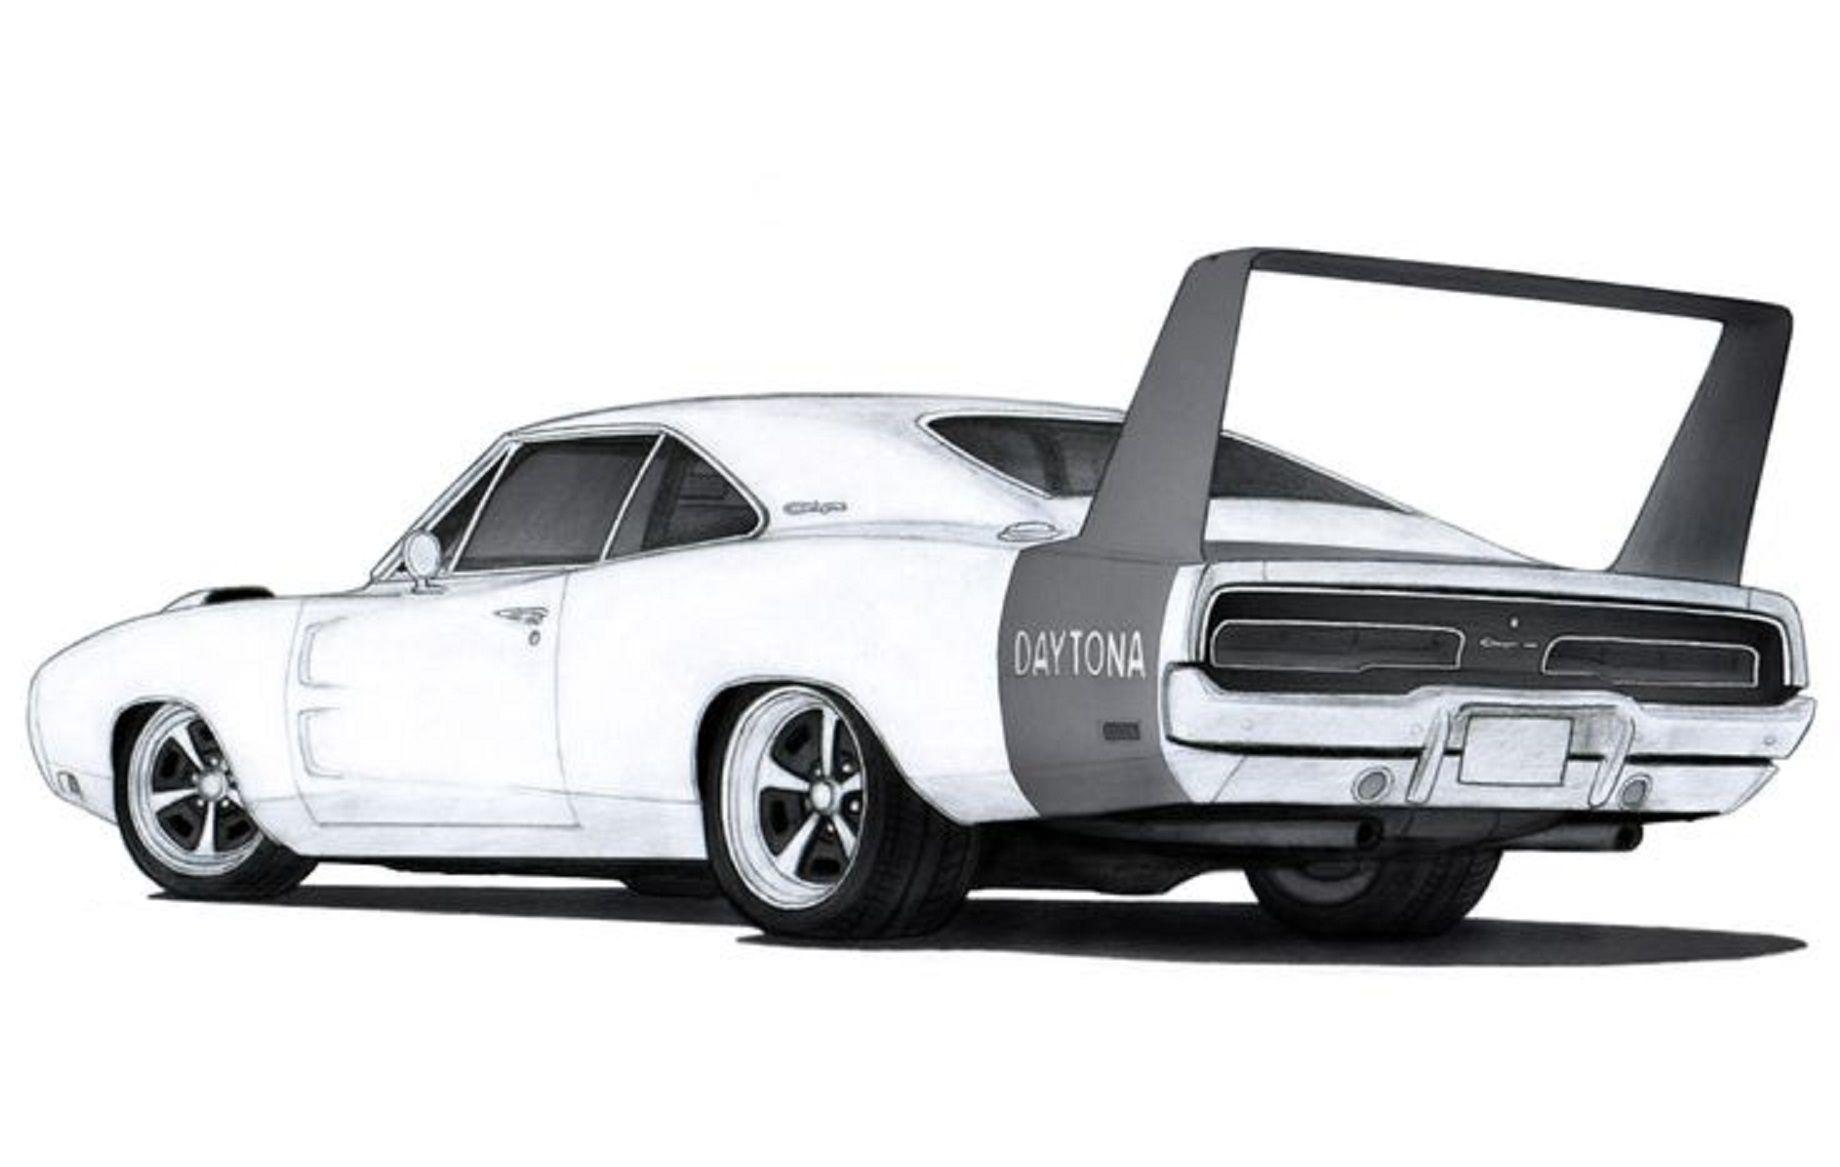 2017 ♡ RESTFUL DRAWINGS ) ☞ Dodge Daytona..